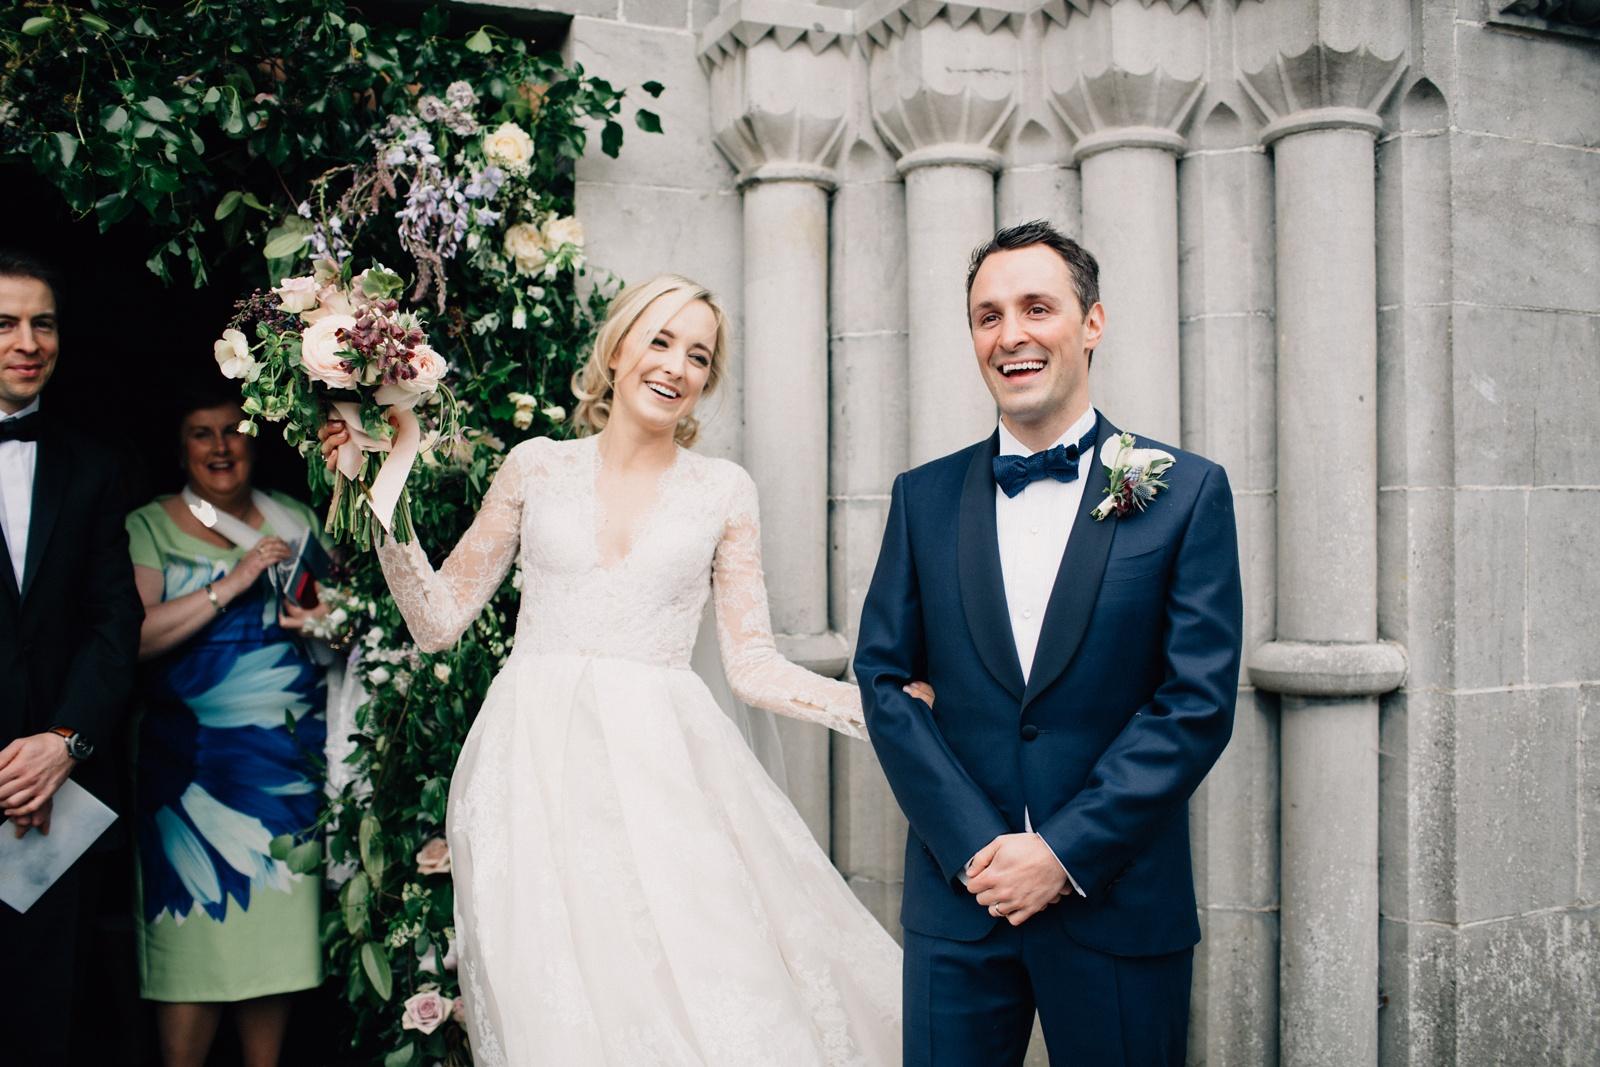 Simone & Darren's Doonbeg Wedding